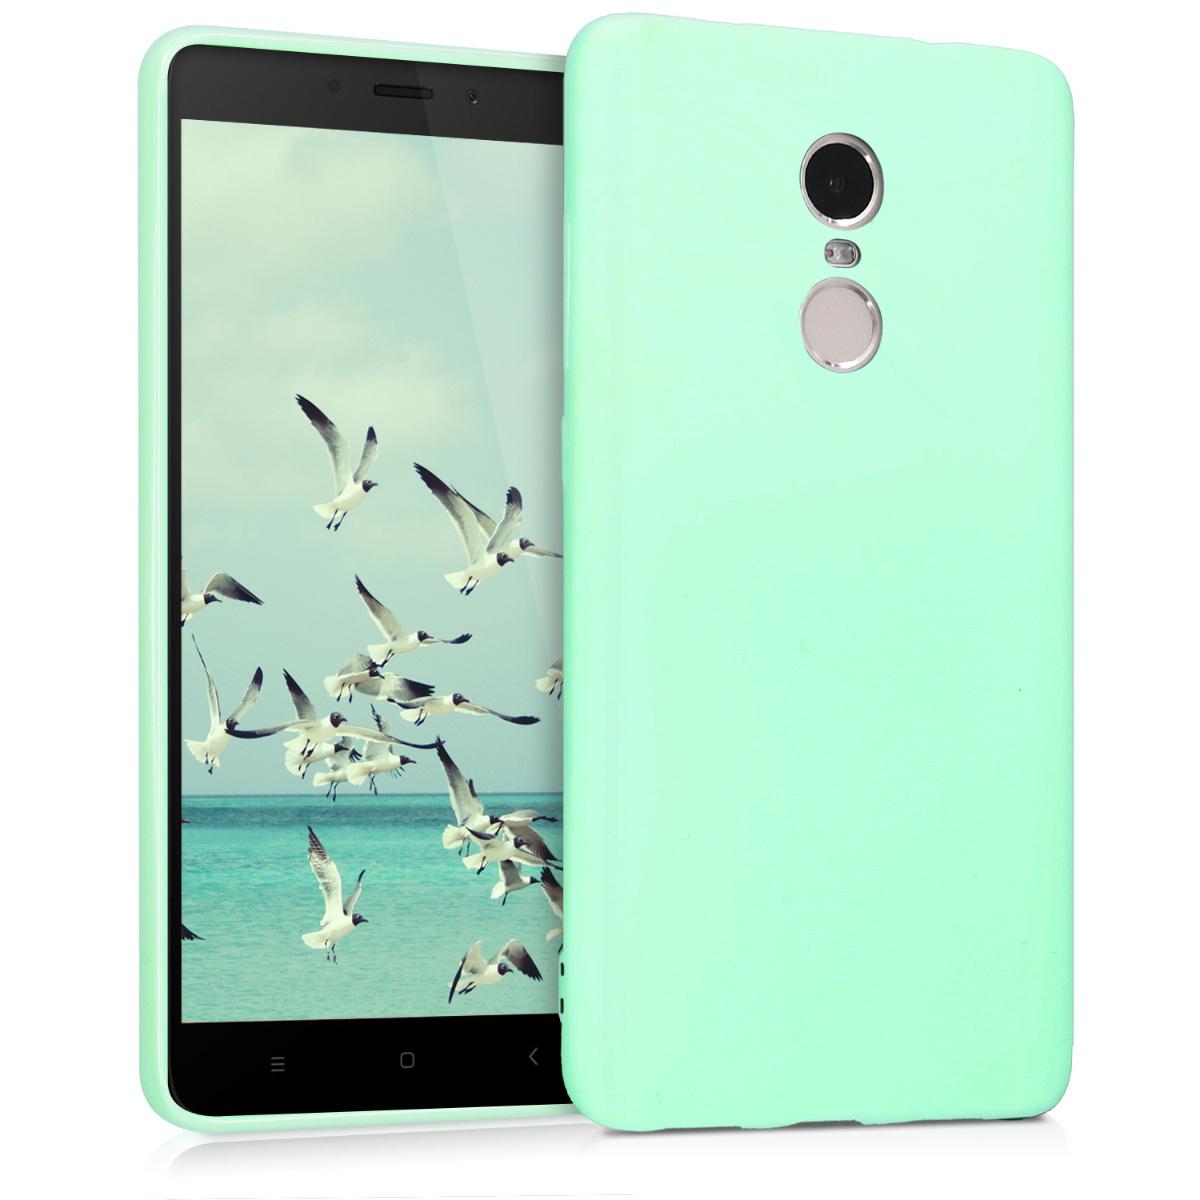 KW Θήκη Σιλικόνης Xiaomi Redmi Note 4 / Note 4X - Mint Matte (43020.50)